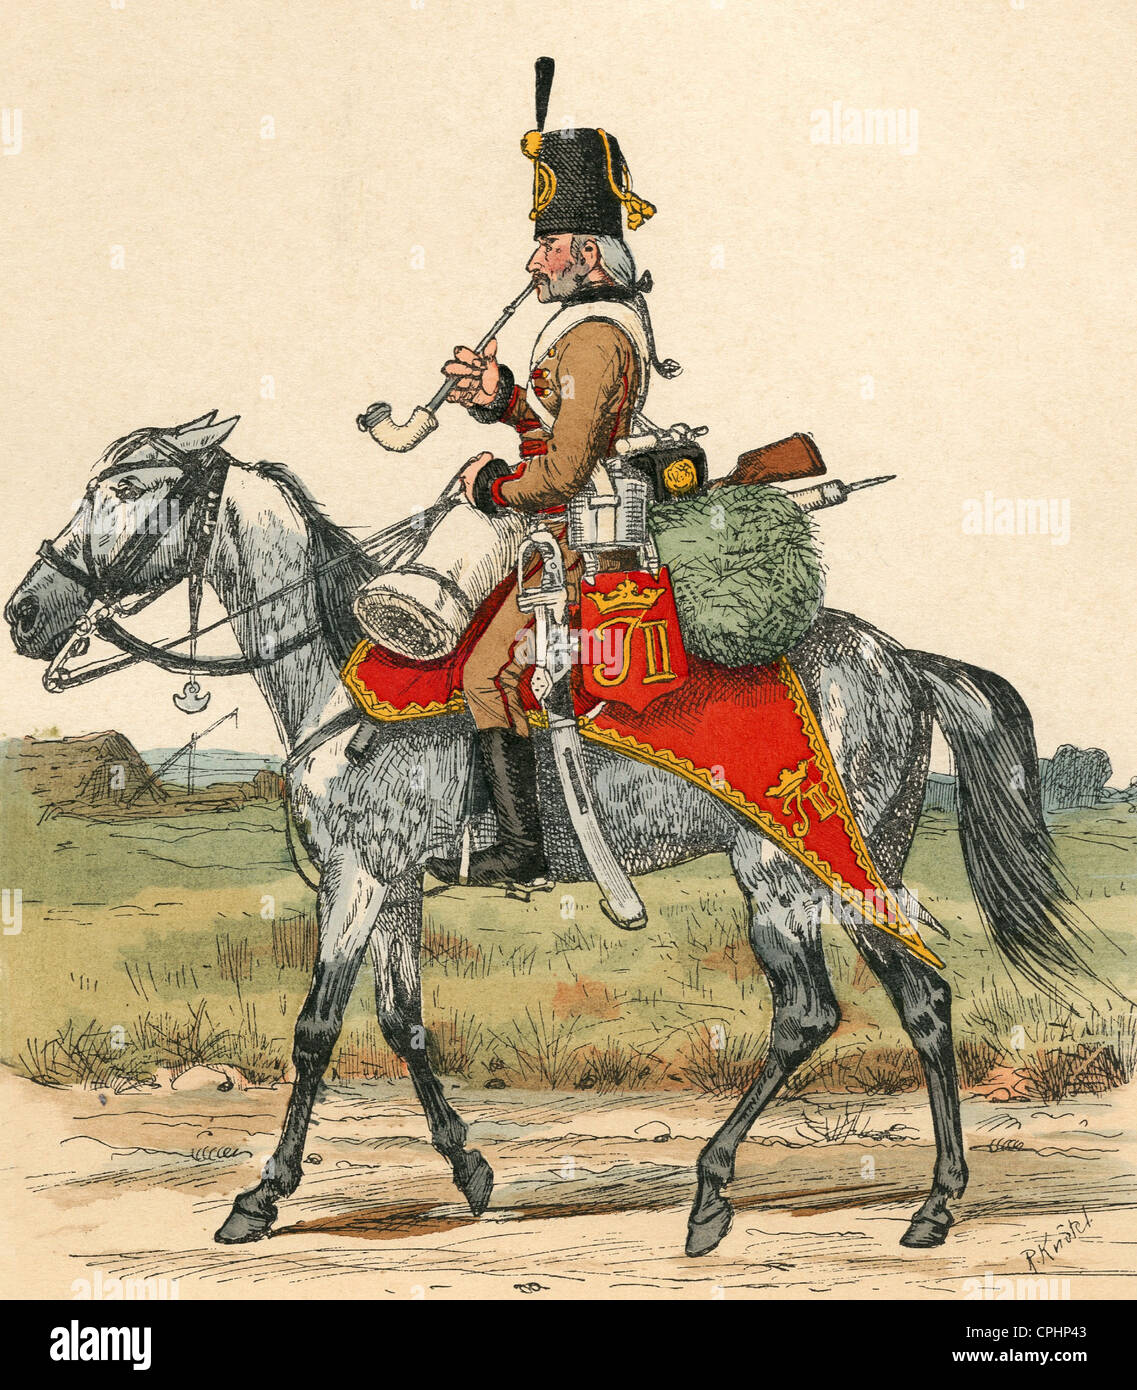 Hussar from Brentano's Slavonic-Croatian border volunteer corps - Stock Image